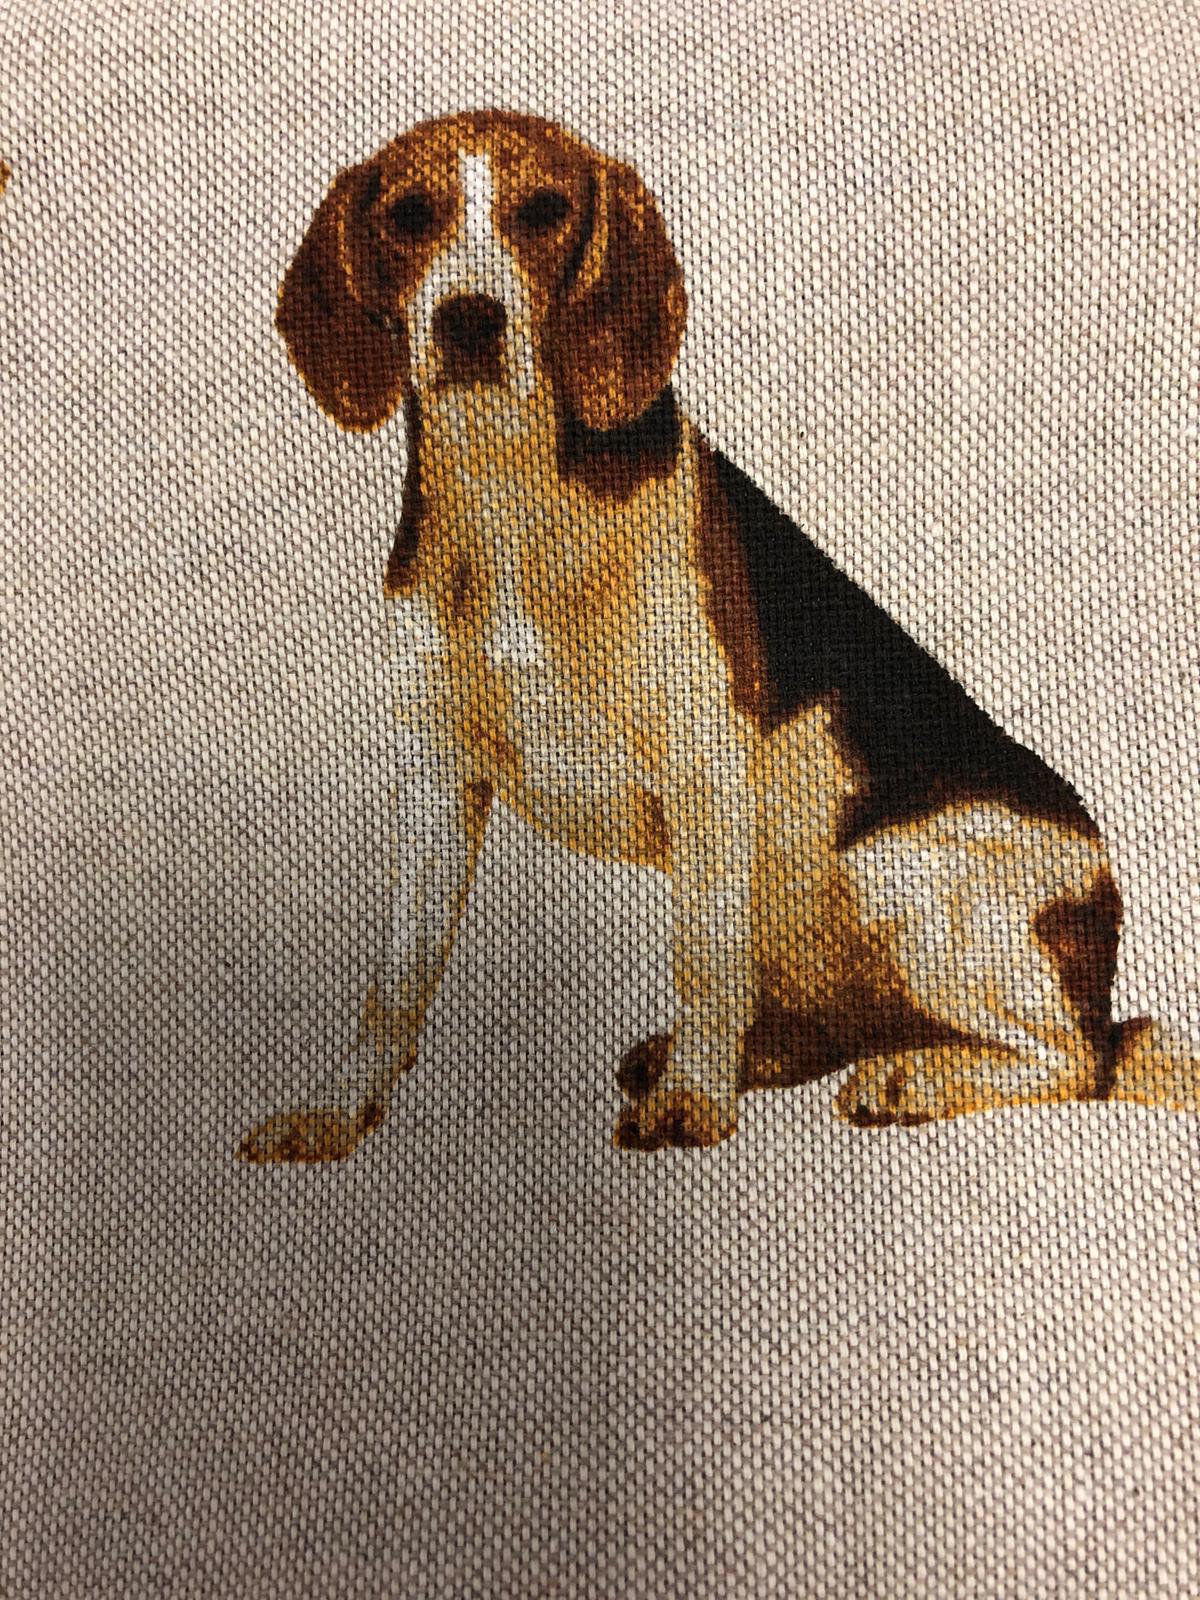 """Eddie the Beagle"" Detail"